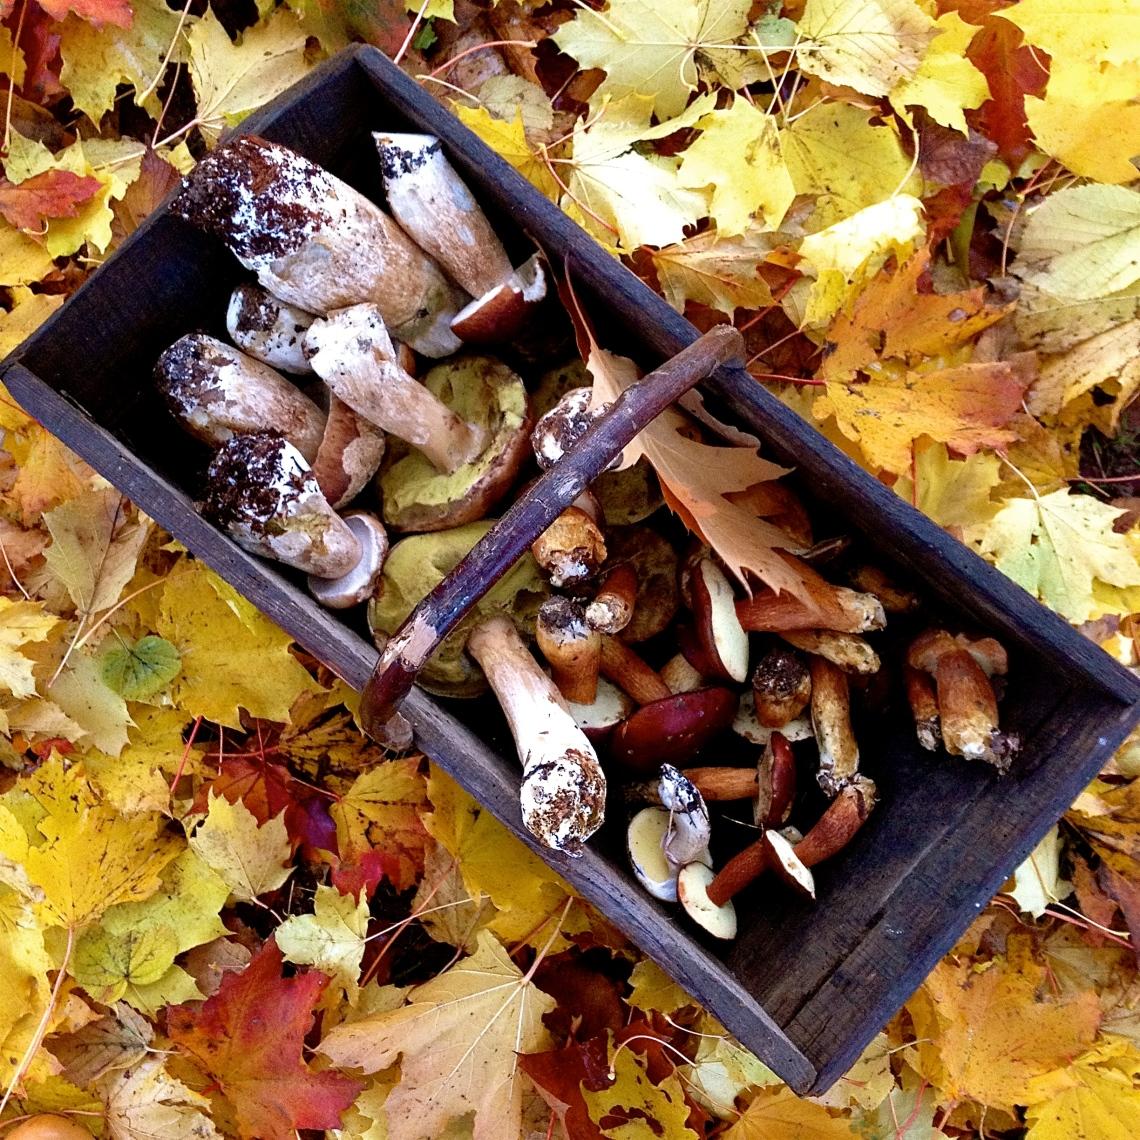 Cueillette sauvage champignon 48